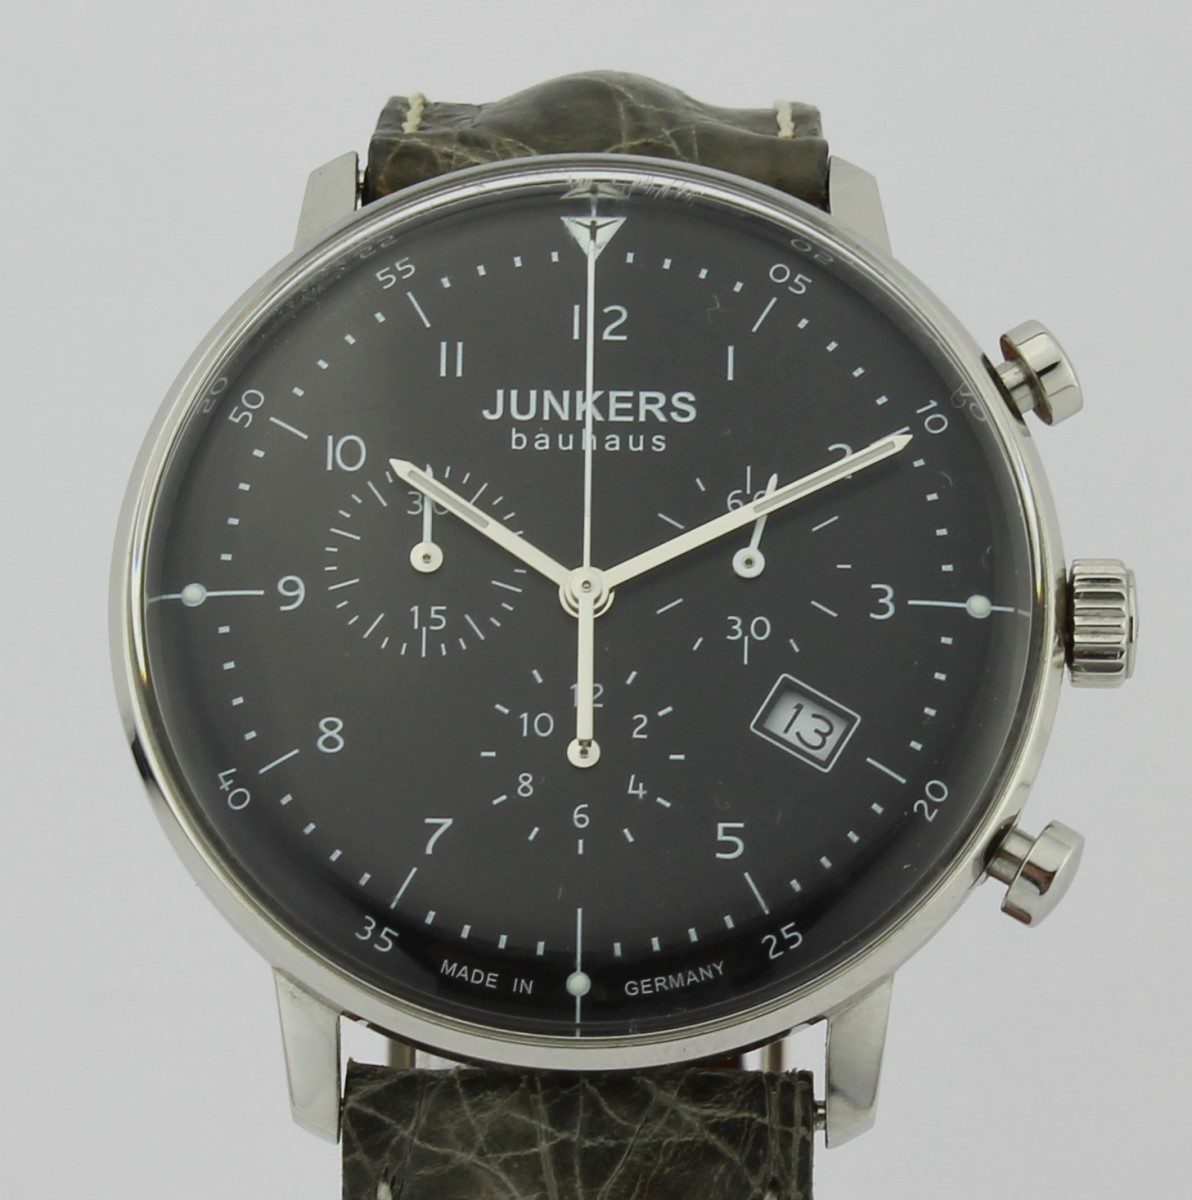 Junkers Bauhaus Quartz Chronograph 6086-2 - Corello